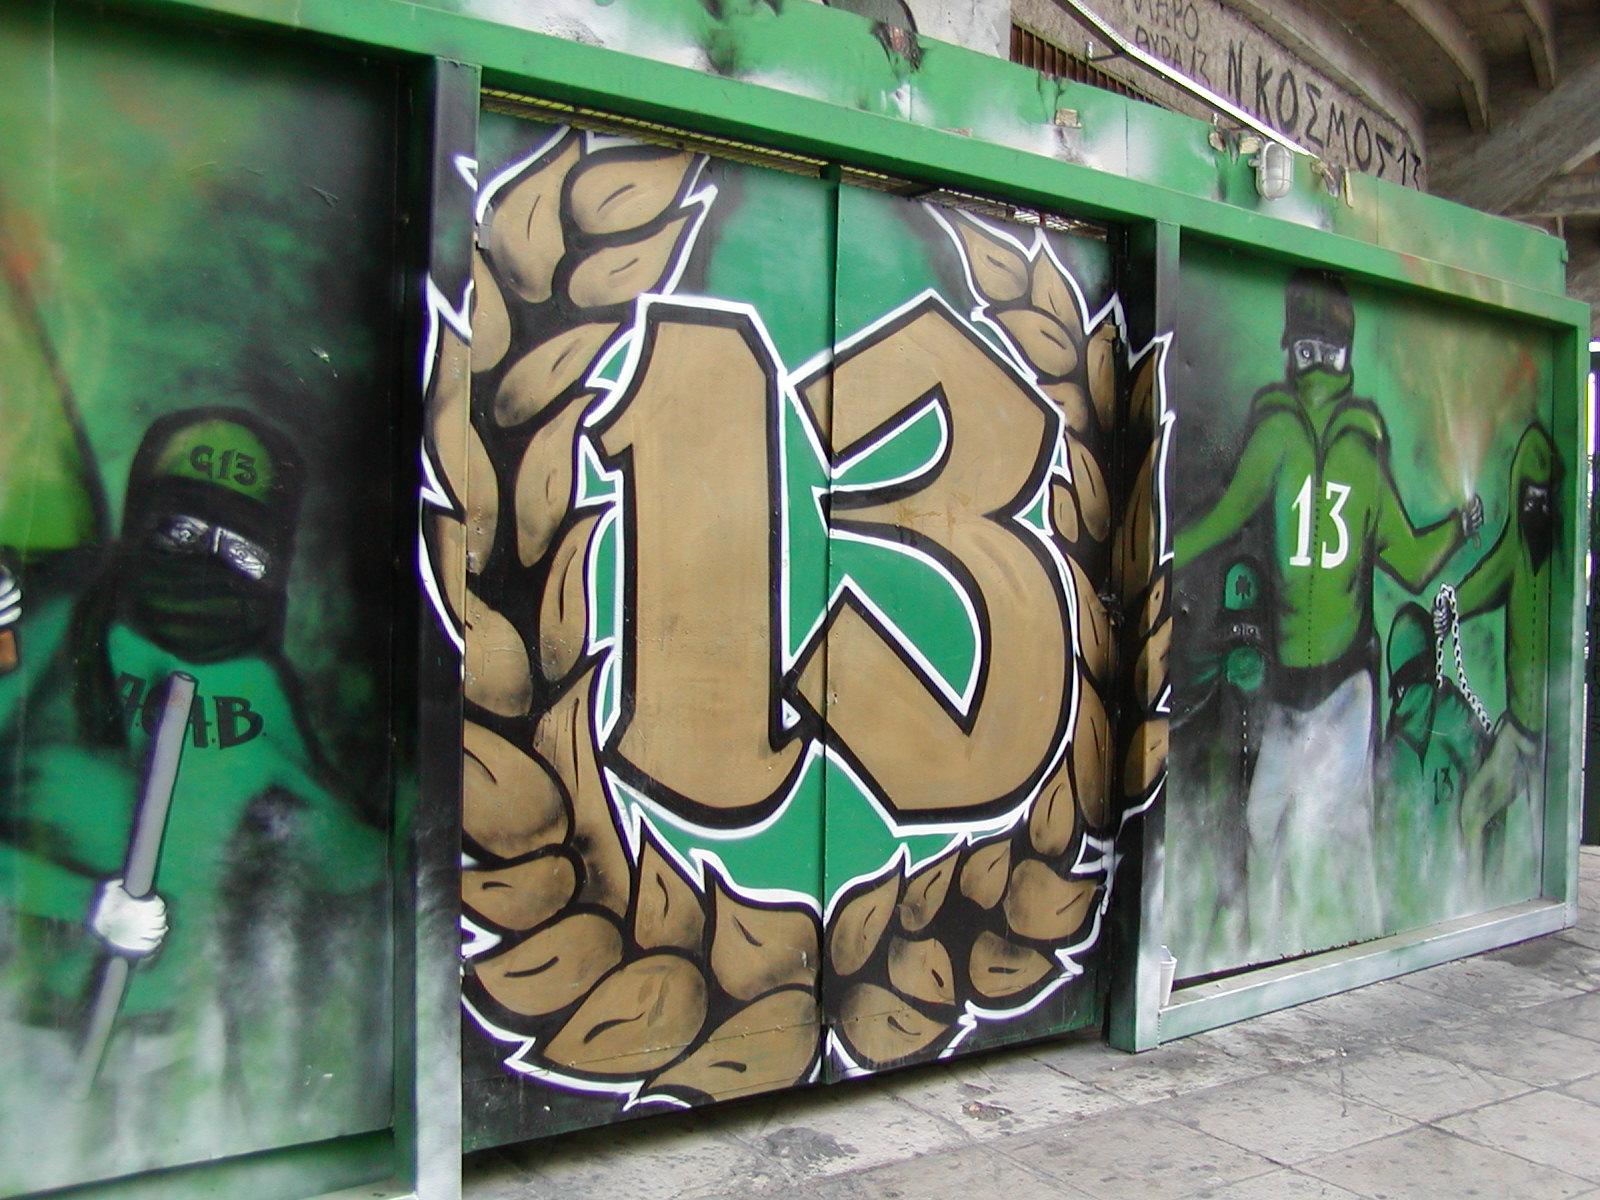 [Image: Apostolos_Nikolaidis_Stadium_Gate_13_Entrance.JPG]